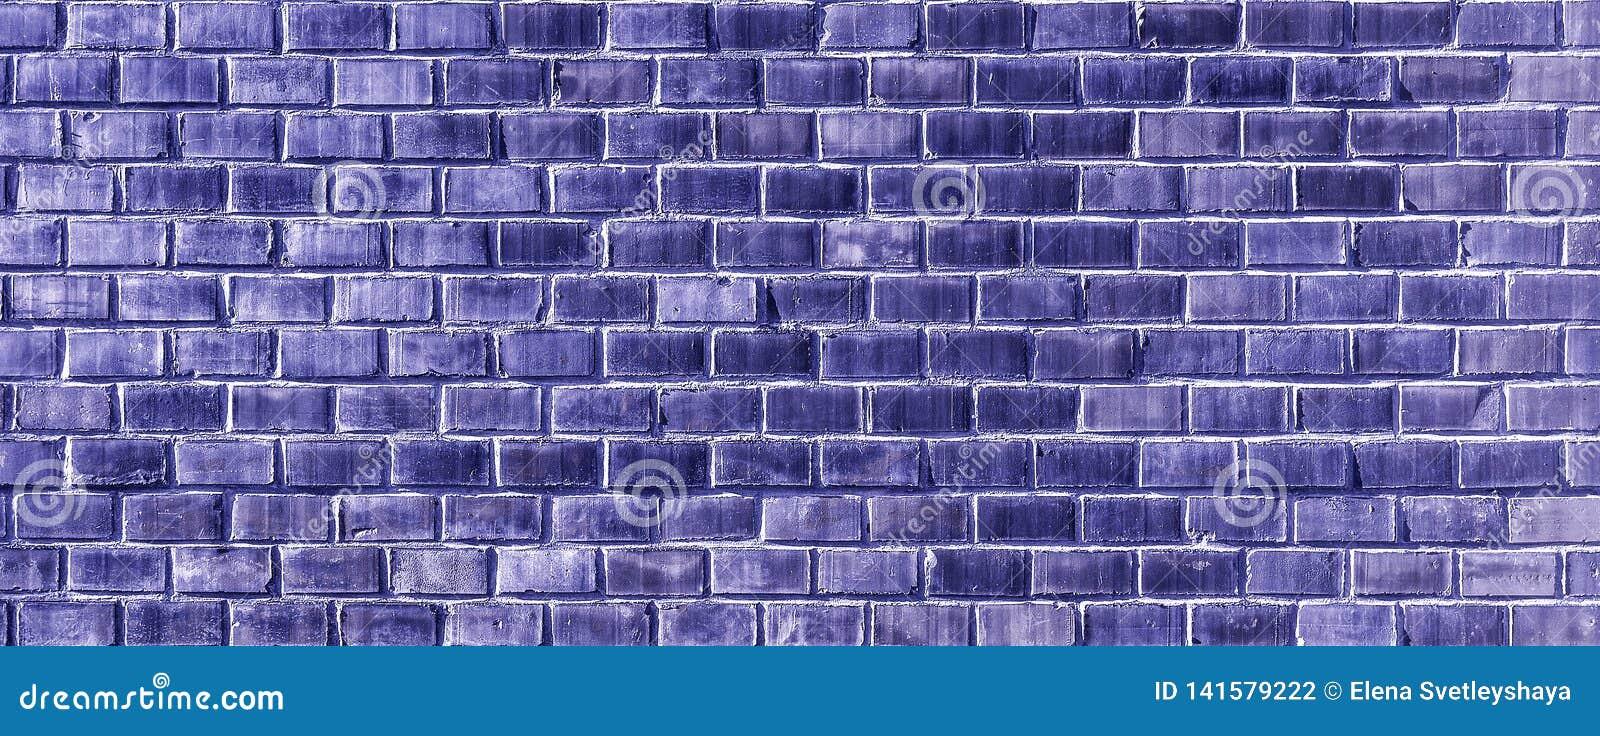 . Navy Blue Brick Wall Texture Close Up Stock Photo   Image of design